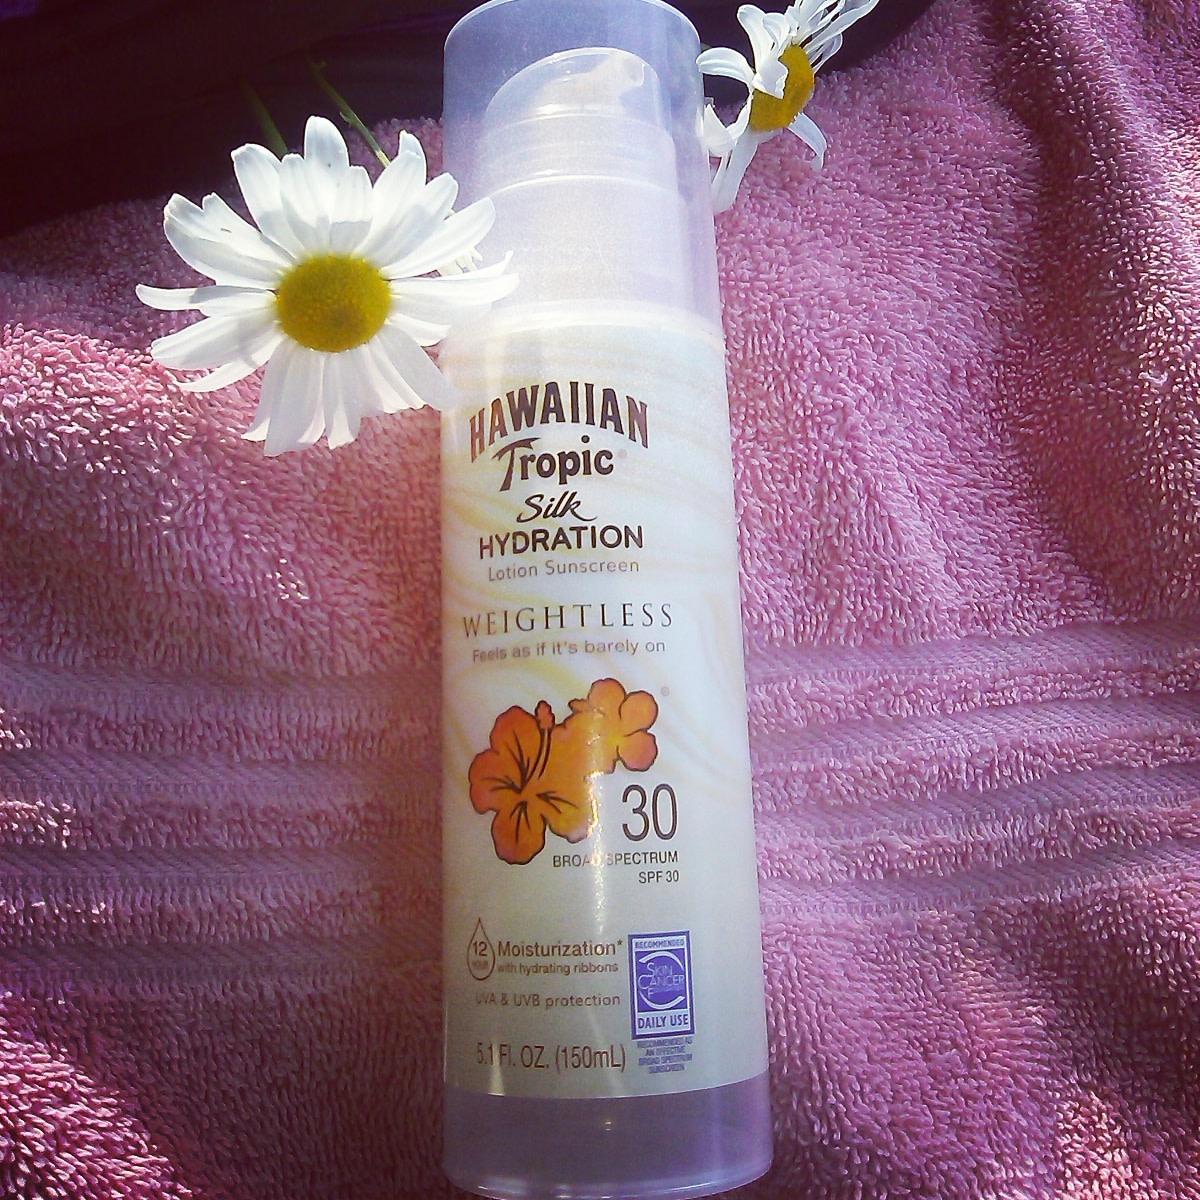 Hawaiian Tropic Silk Hydration: My Favorite Sunscreen Lotion